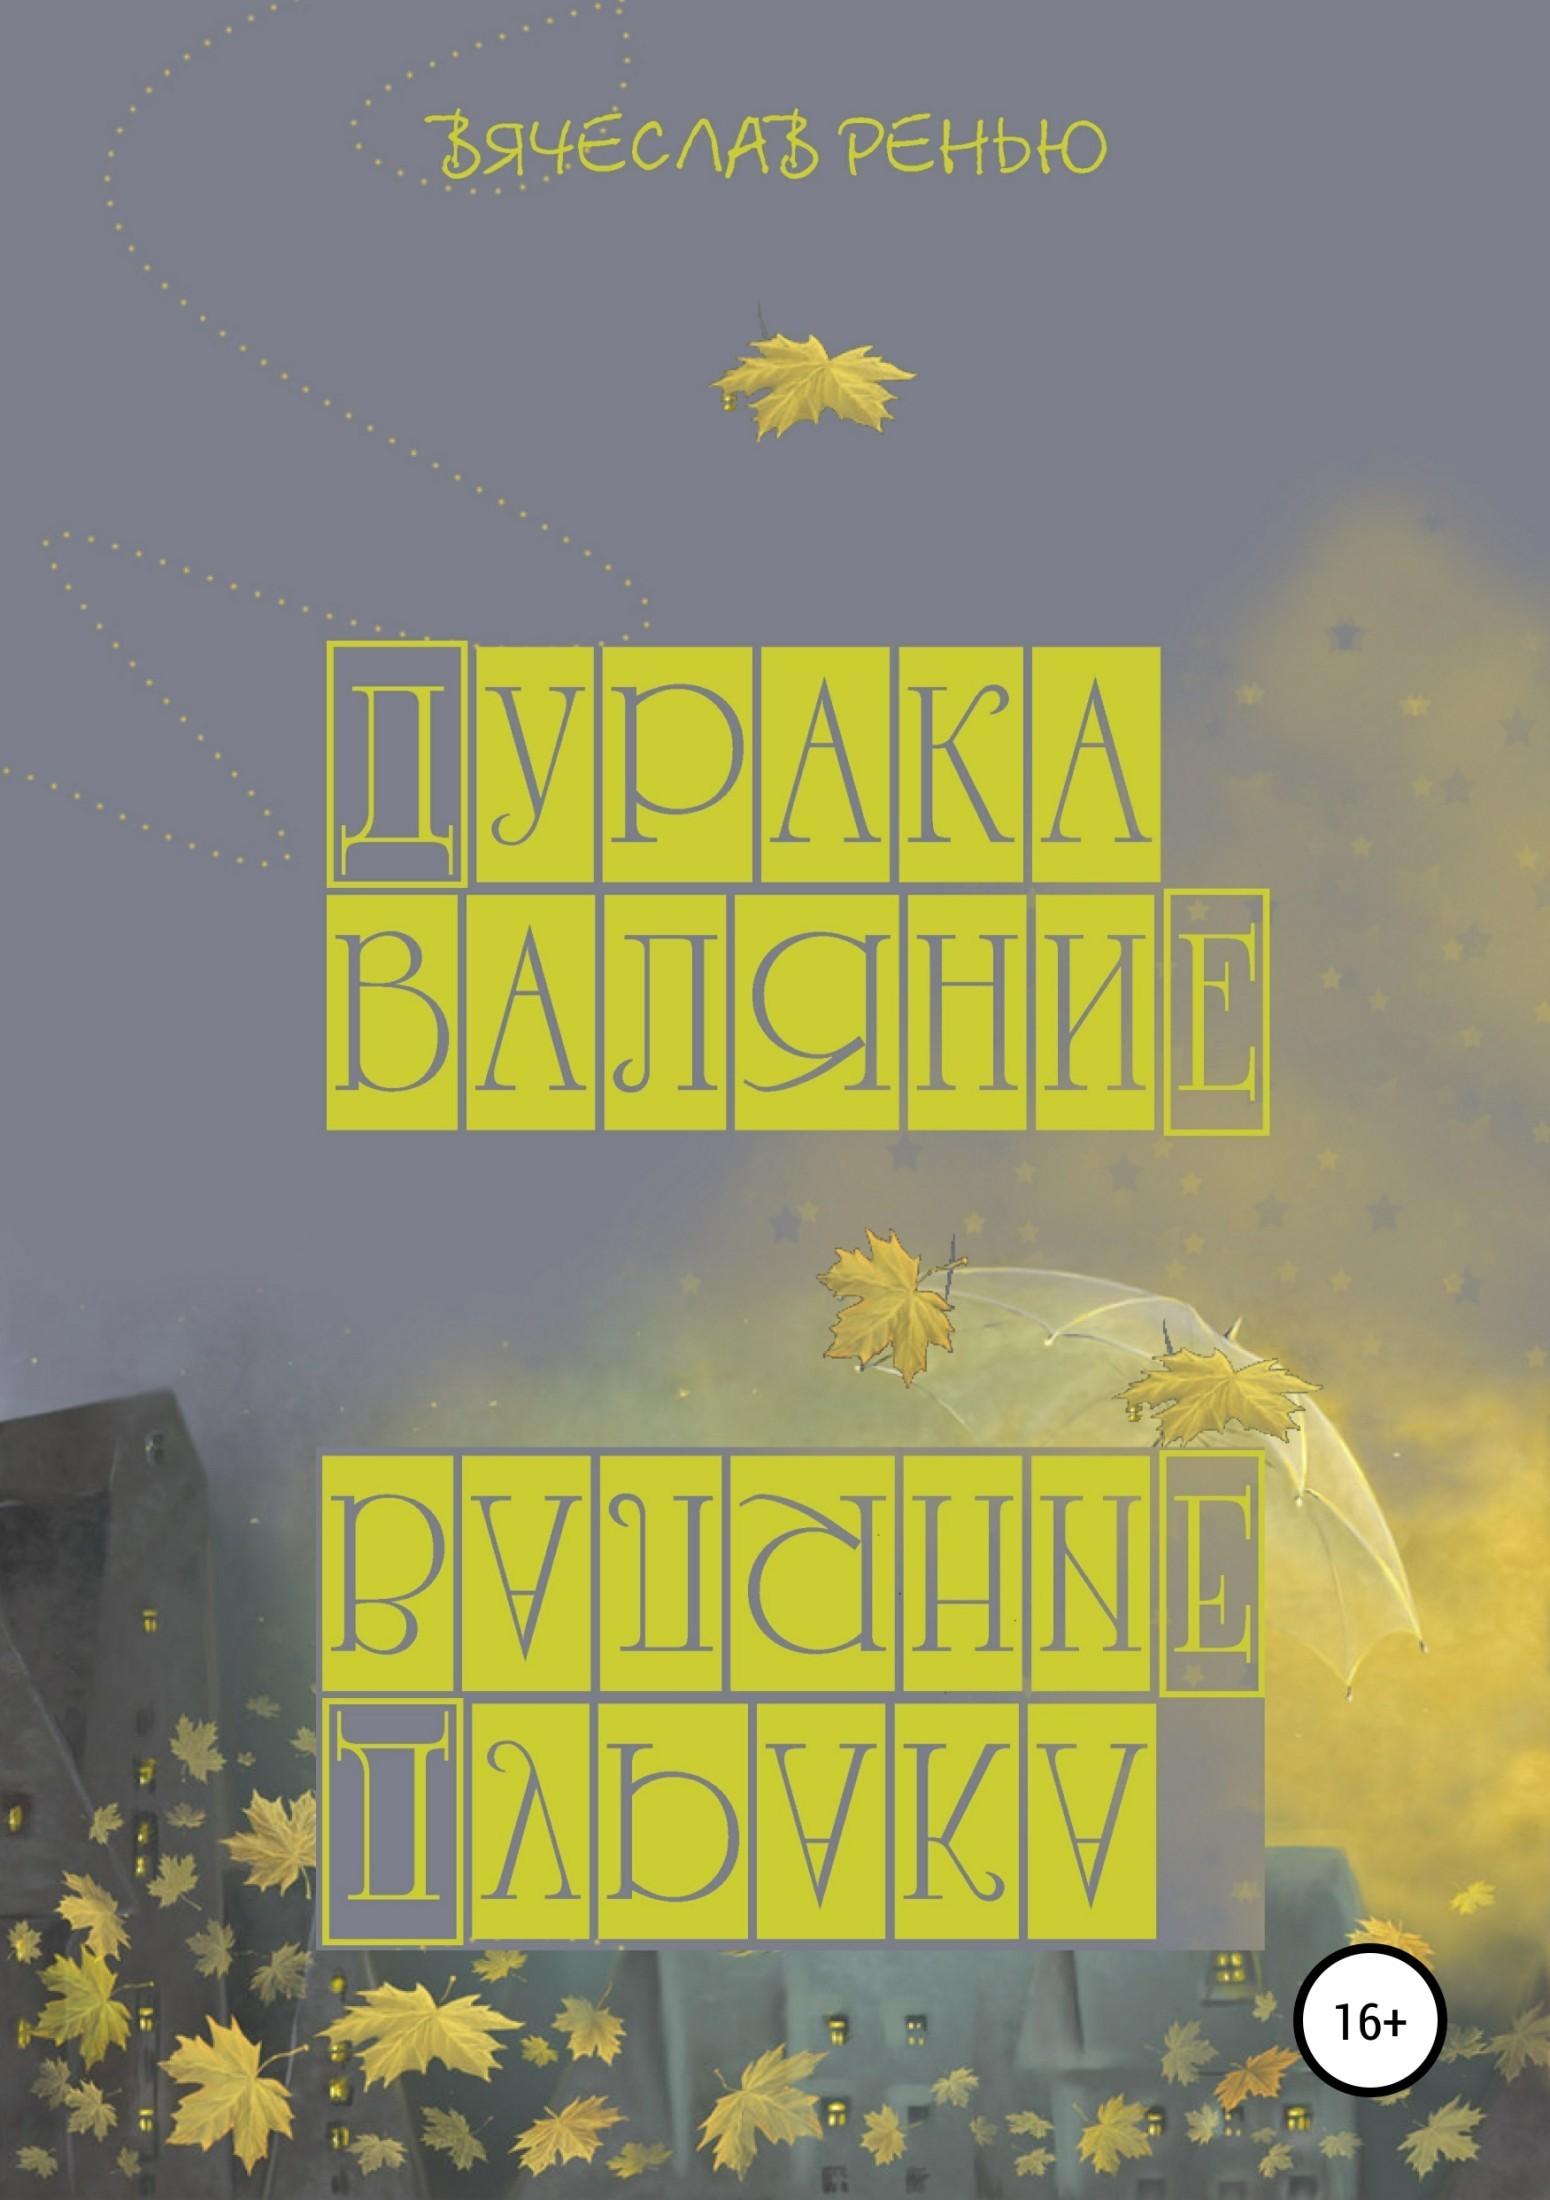 Вячеслав Михайлович Ренью Дурака валяние маска ренью